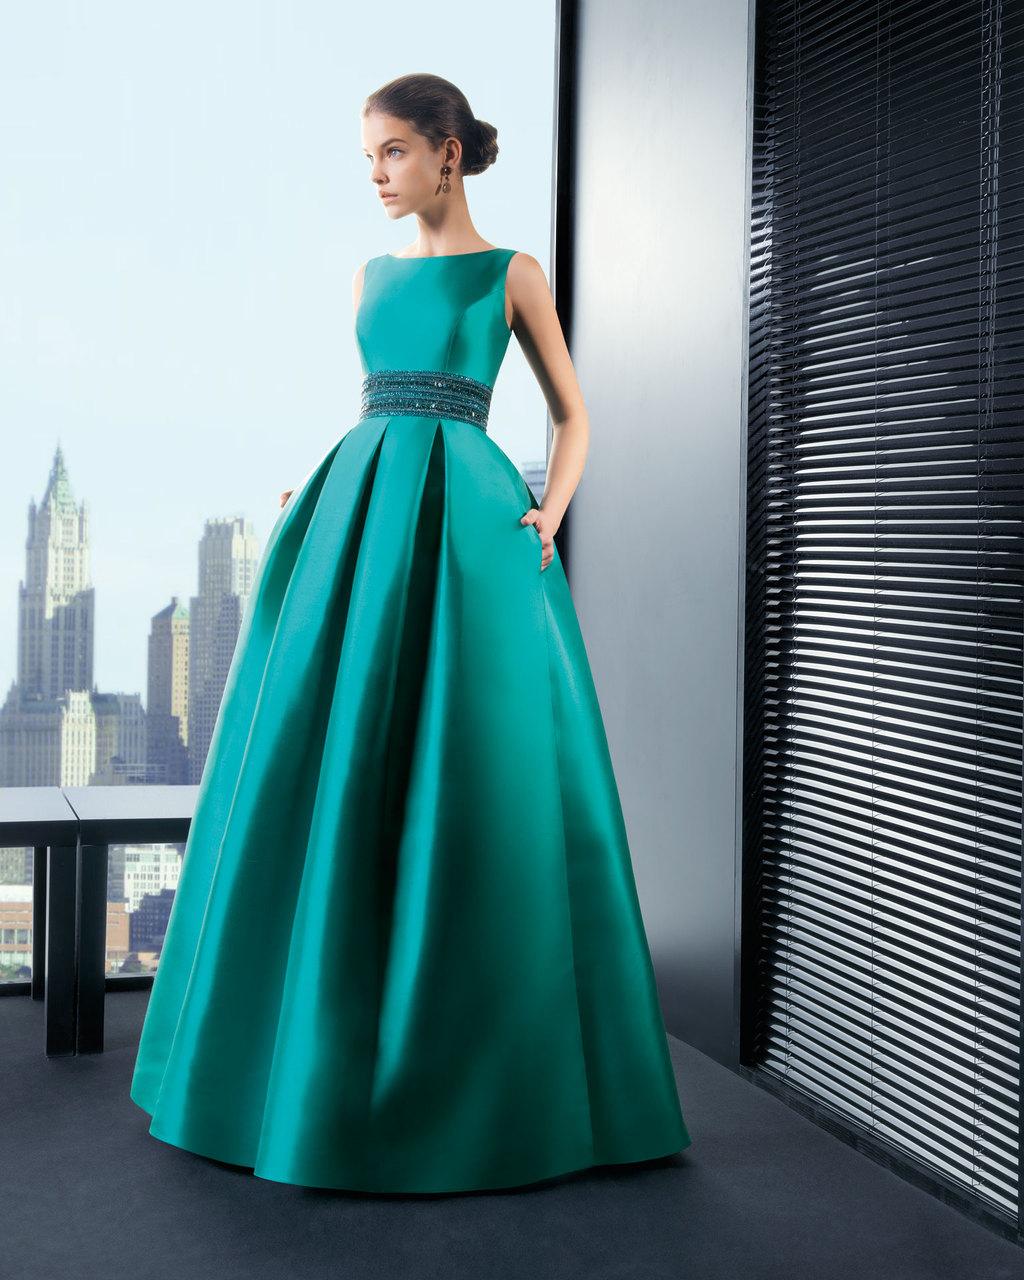 Aqua-satin-bridesmaid-dress-with-pockets.full